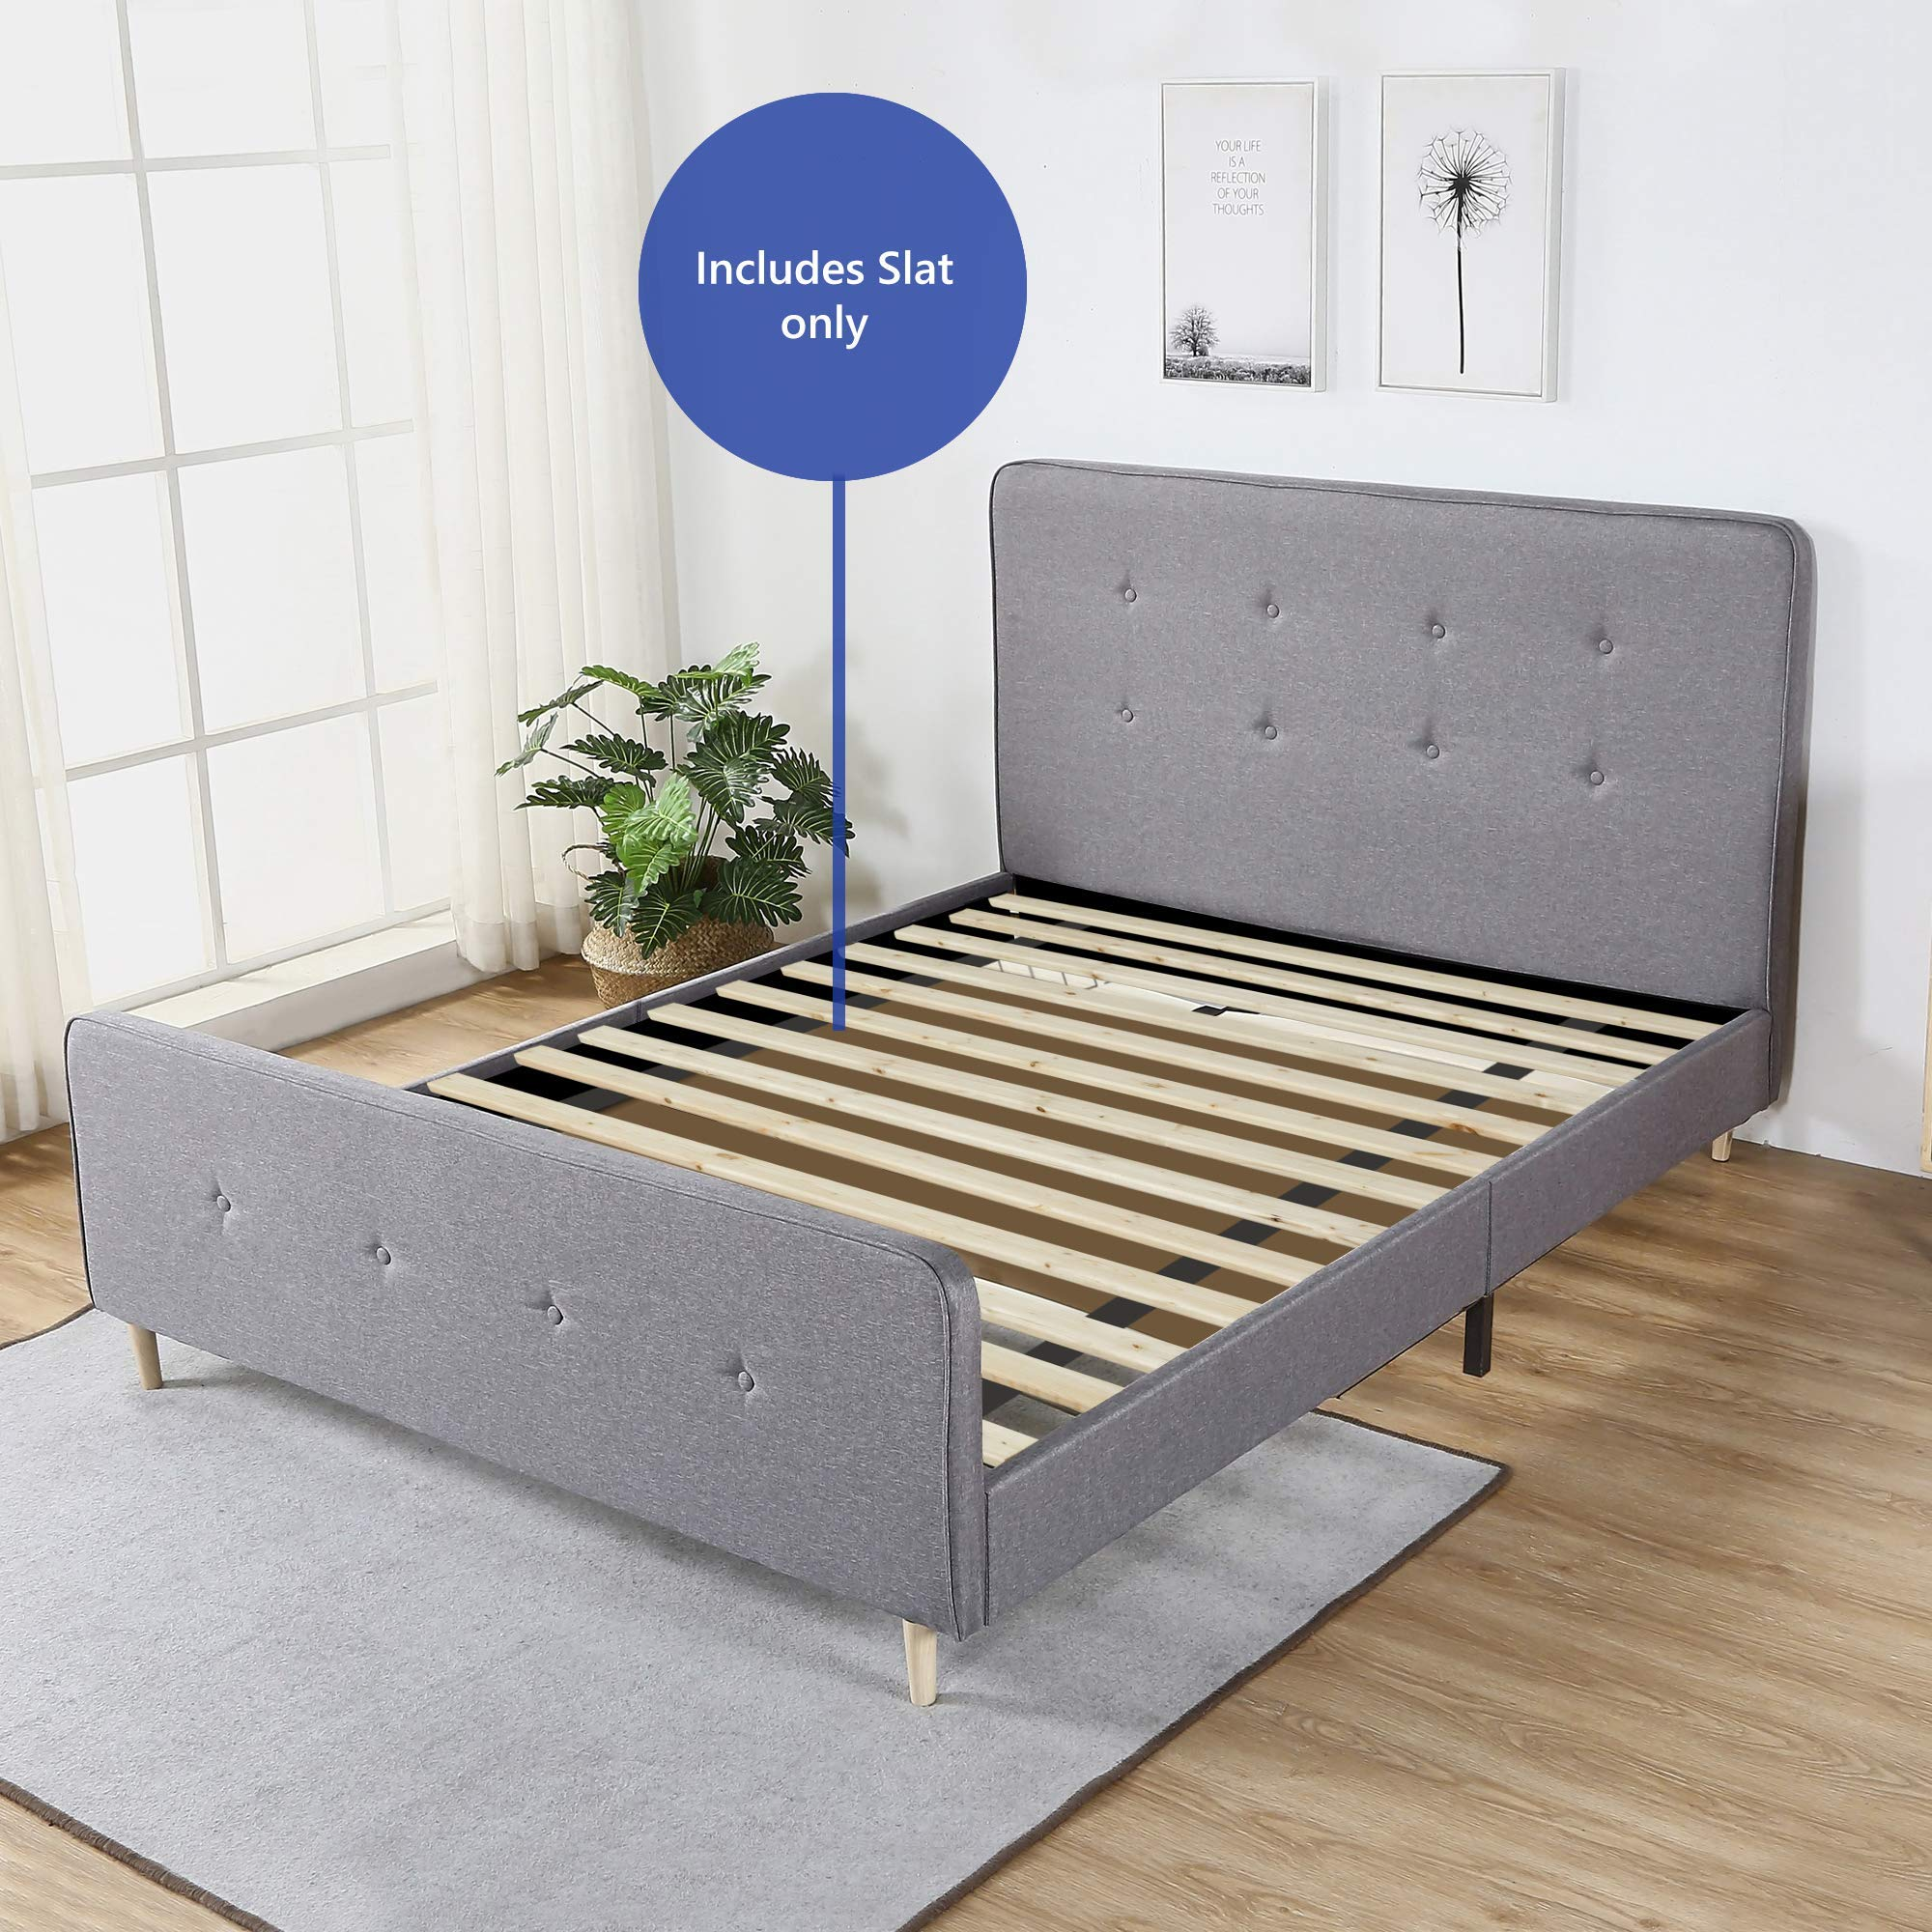 Continental Matress 1-Inch Standard Mattress Support Wooden Bunkie Board/Slats, TwinSize, Beige (Renewed) by Continental Matress